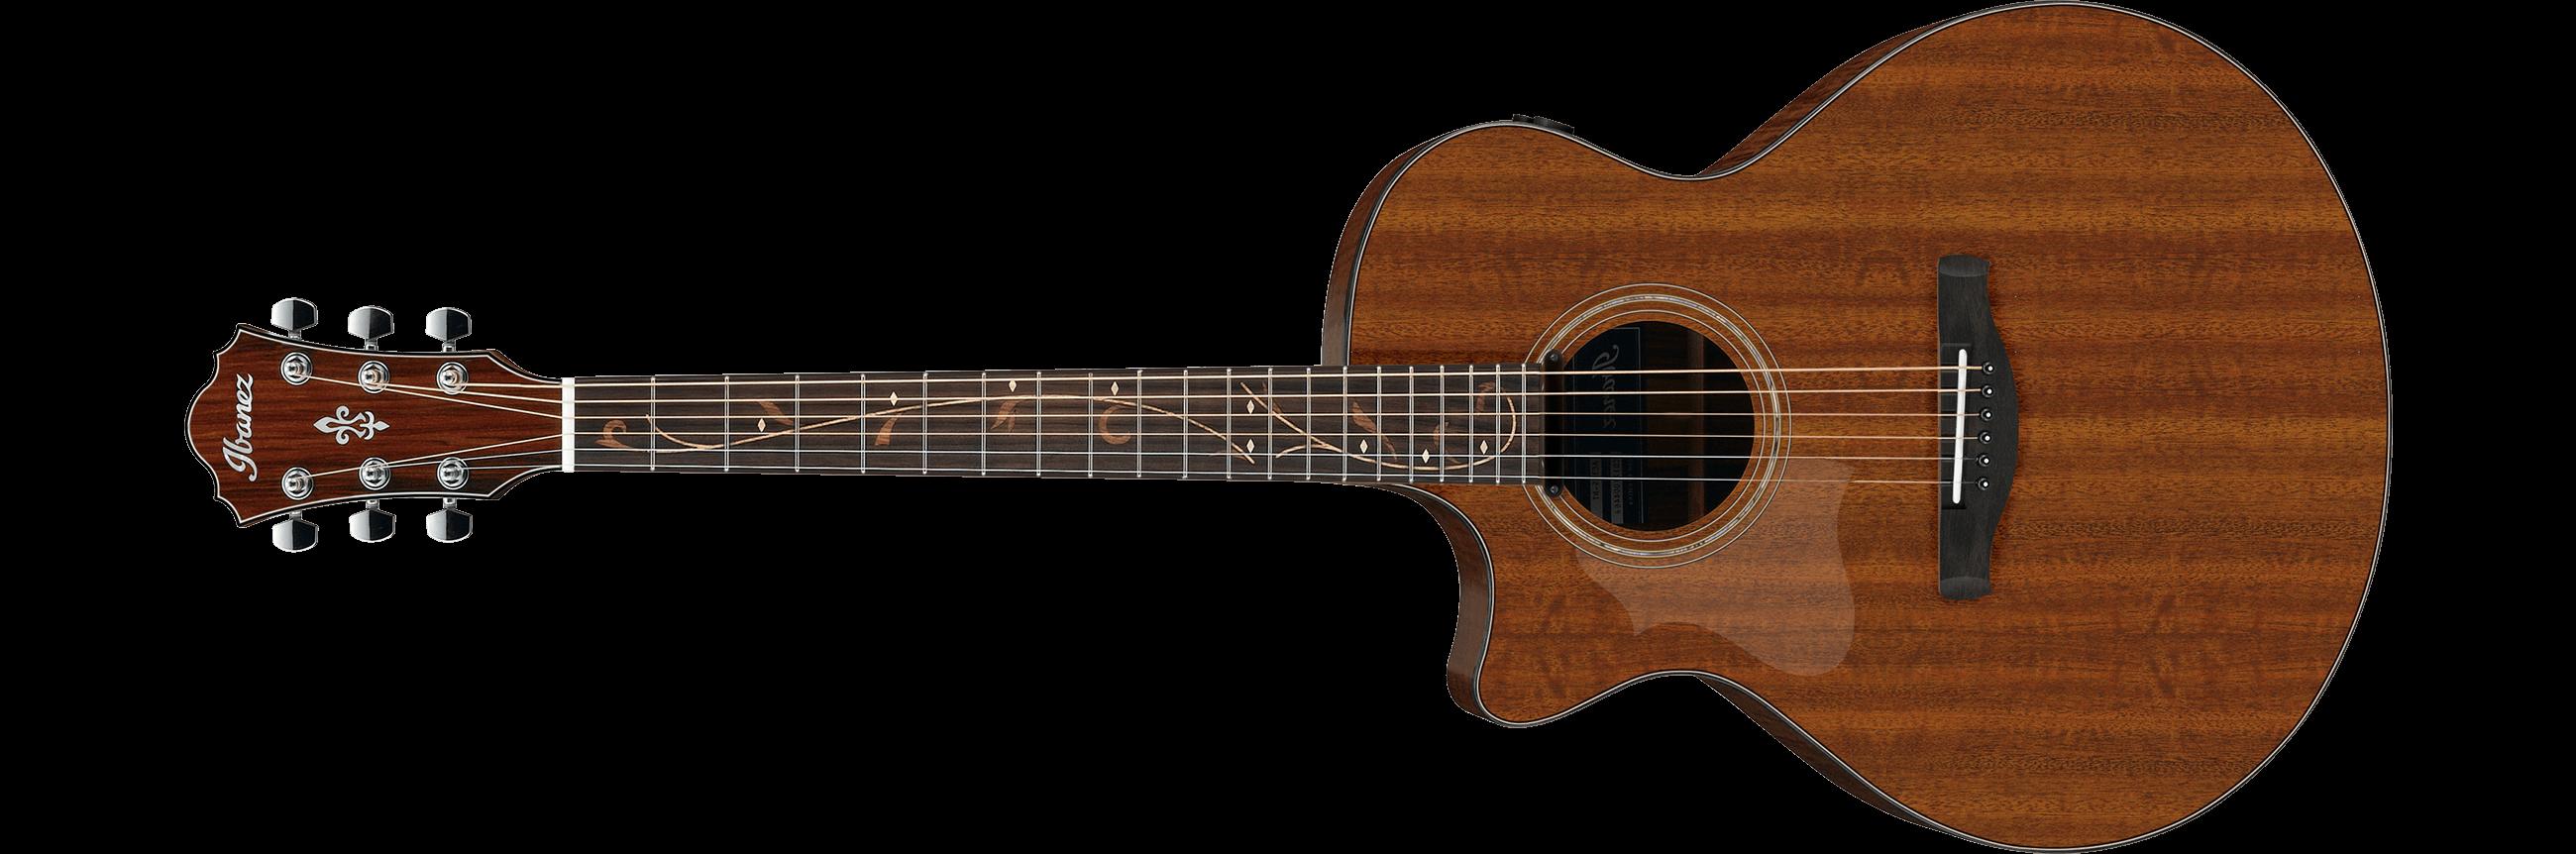 AE295L